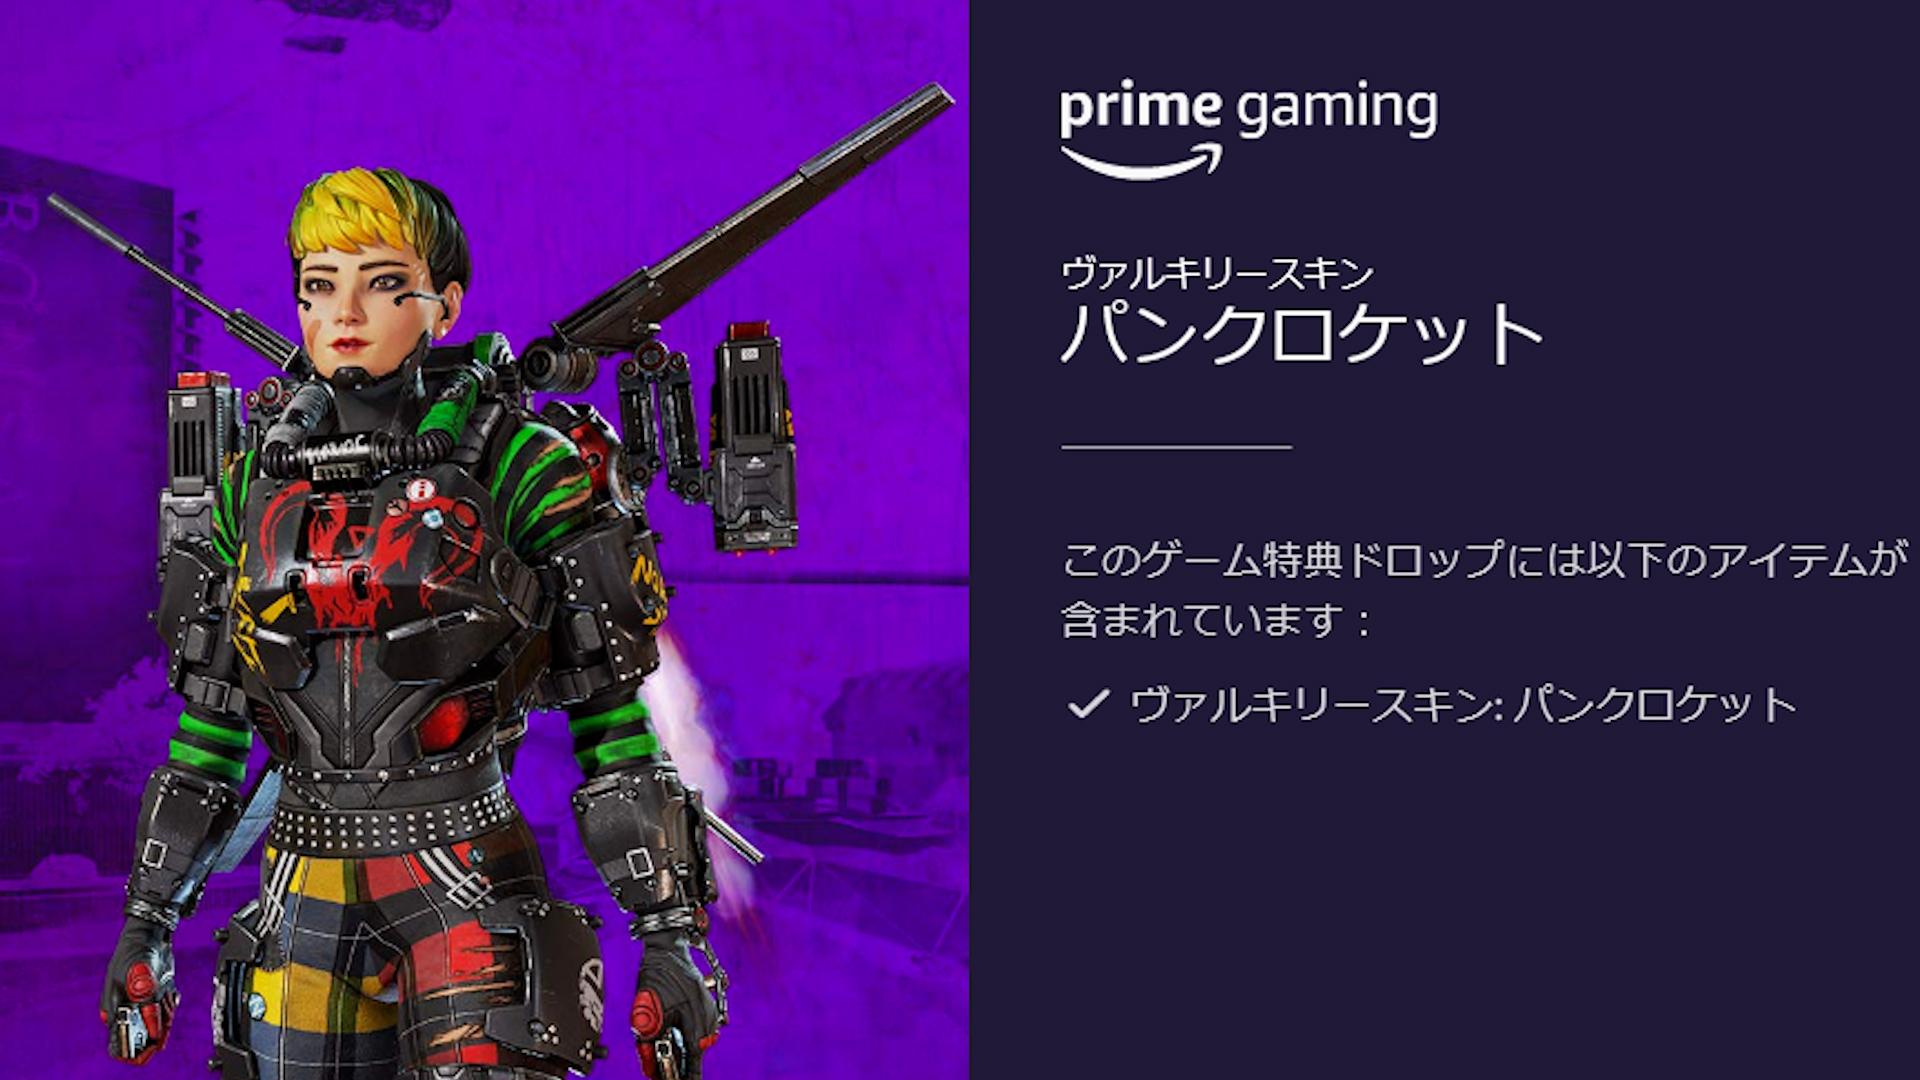 【APEX】「ヴァルキリー」のTwitch Prime限定スキンが日本時間5月13日に登場!!